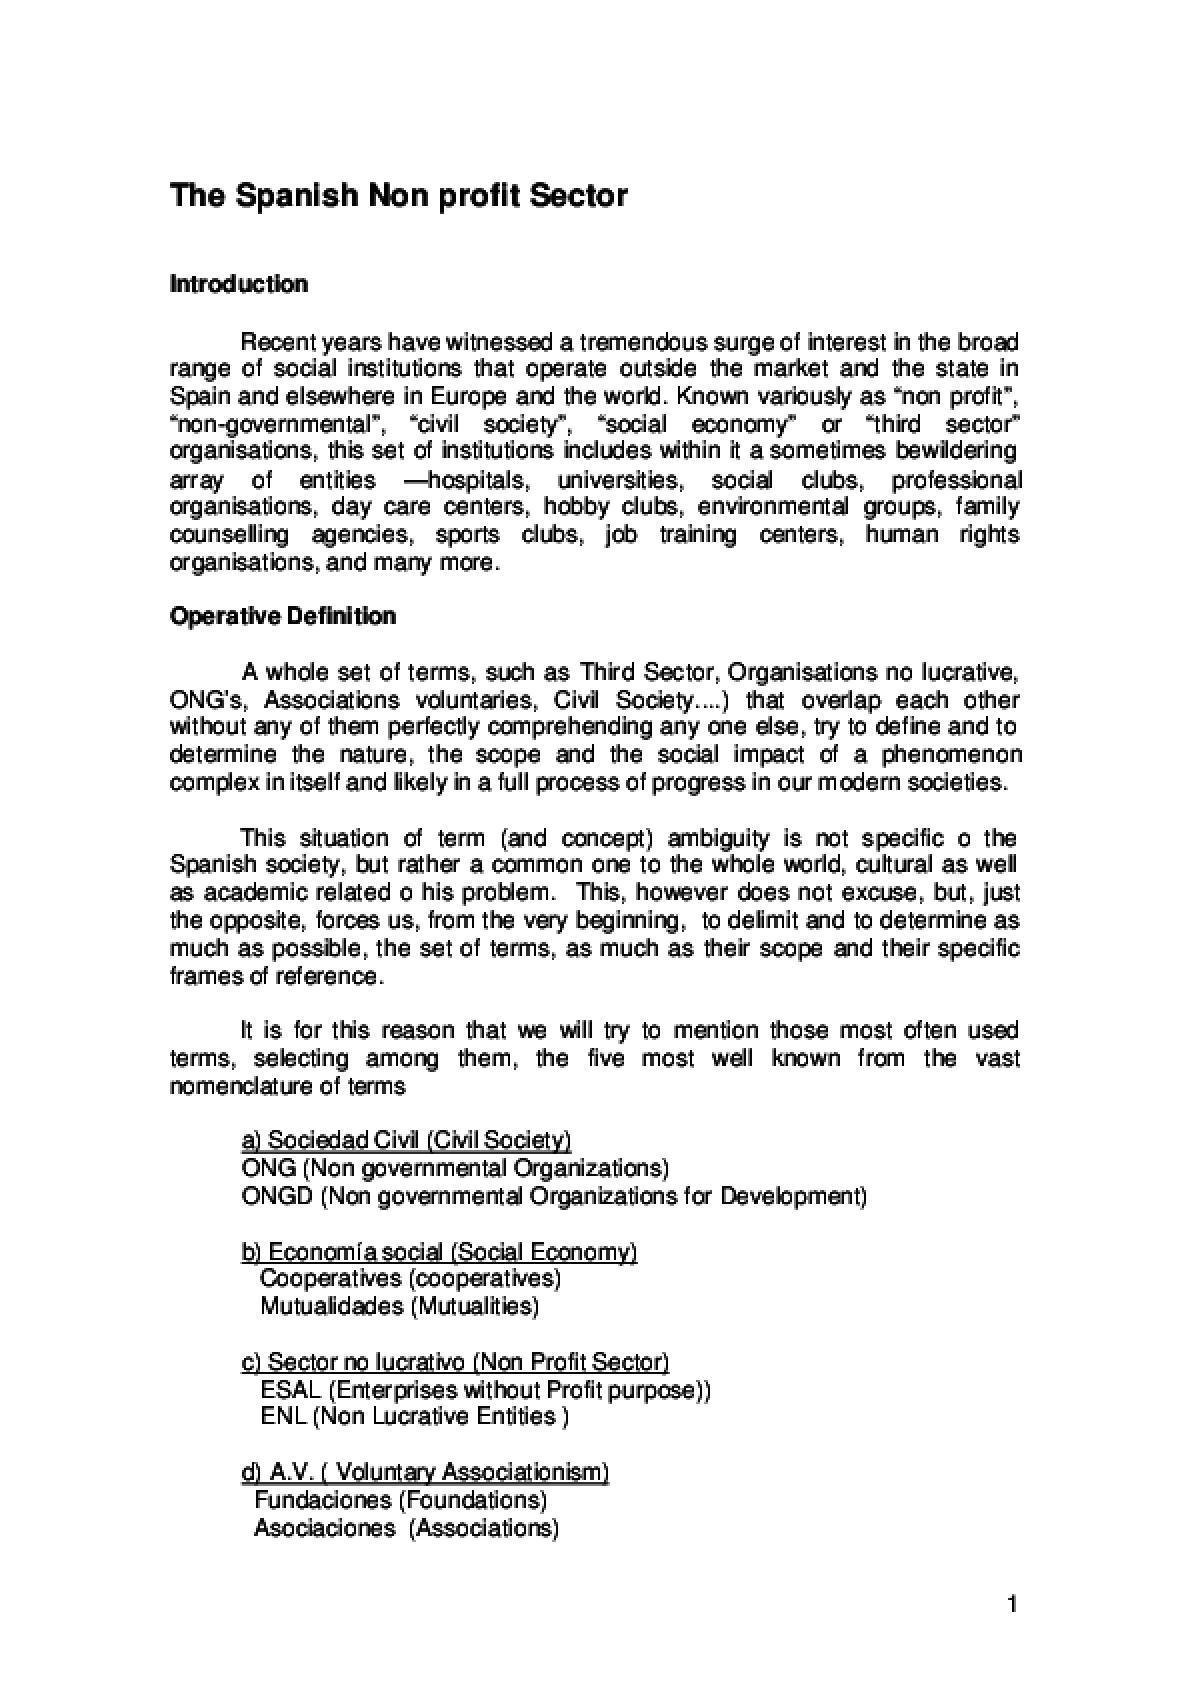 The Spanish Non-profit Sector